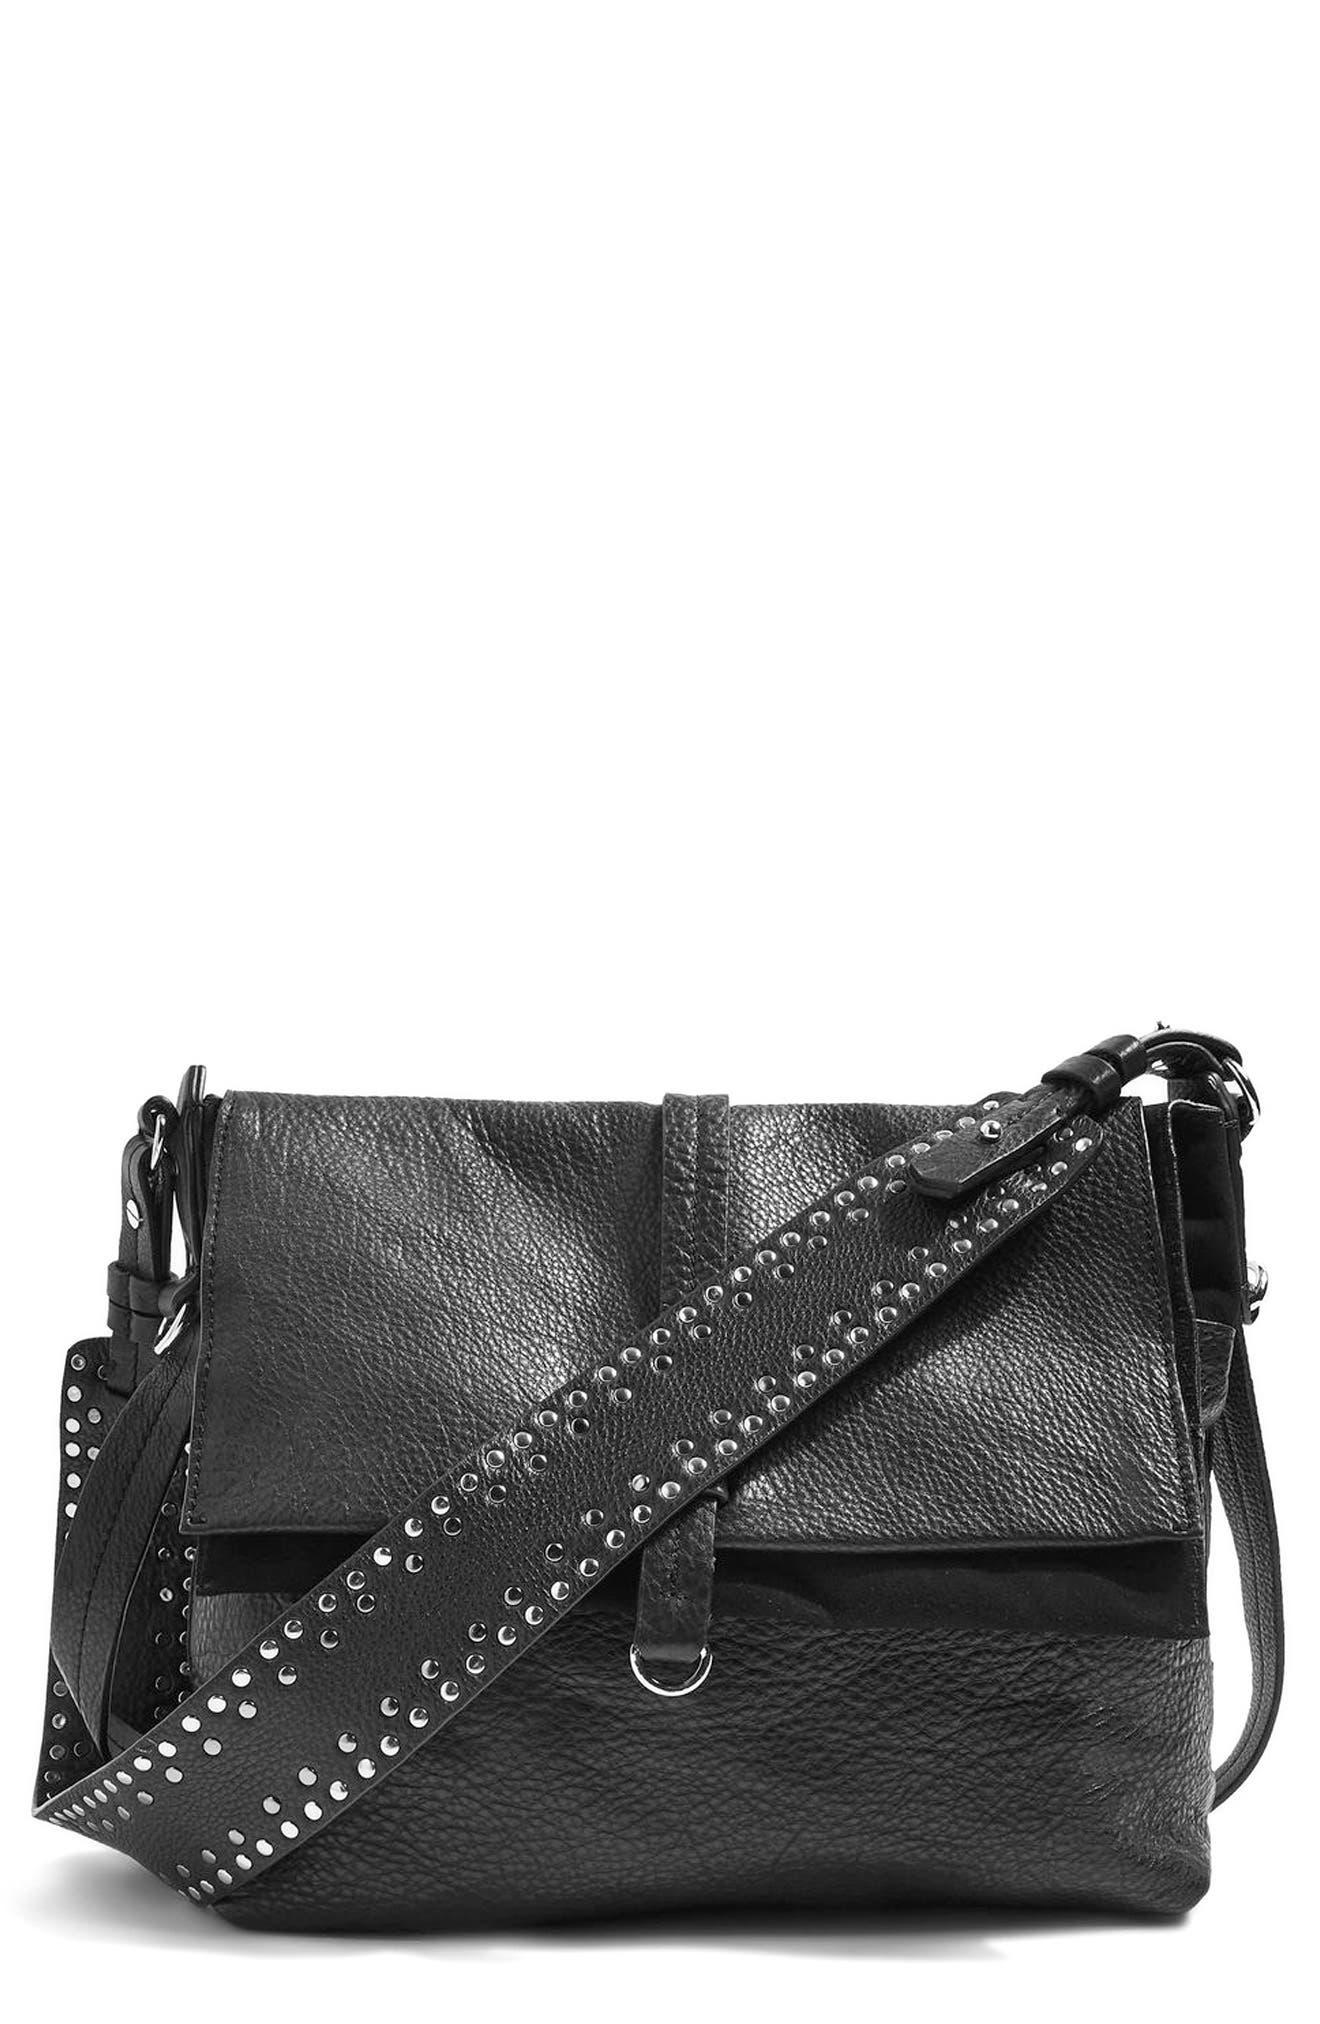 Premium Leather Studded Calfskin Hobo Bag,                         Main,                         color, Black